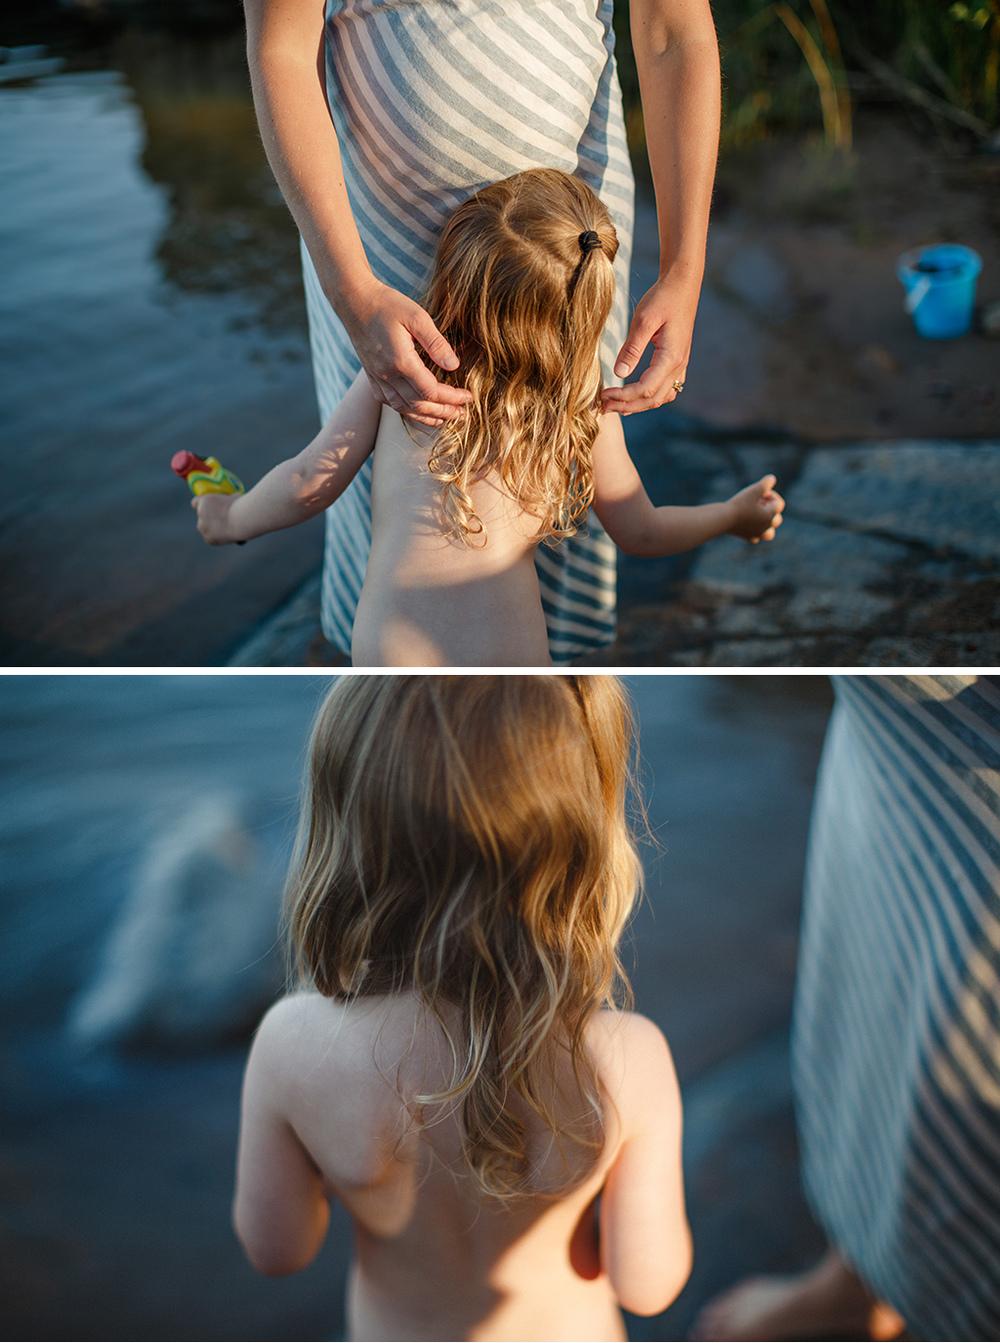 Lifestyle-familjefotografering_Familjefotograf-Anna-Sandstrom-12.jpg